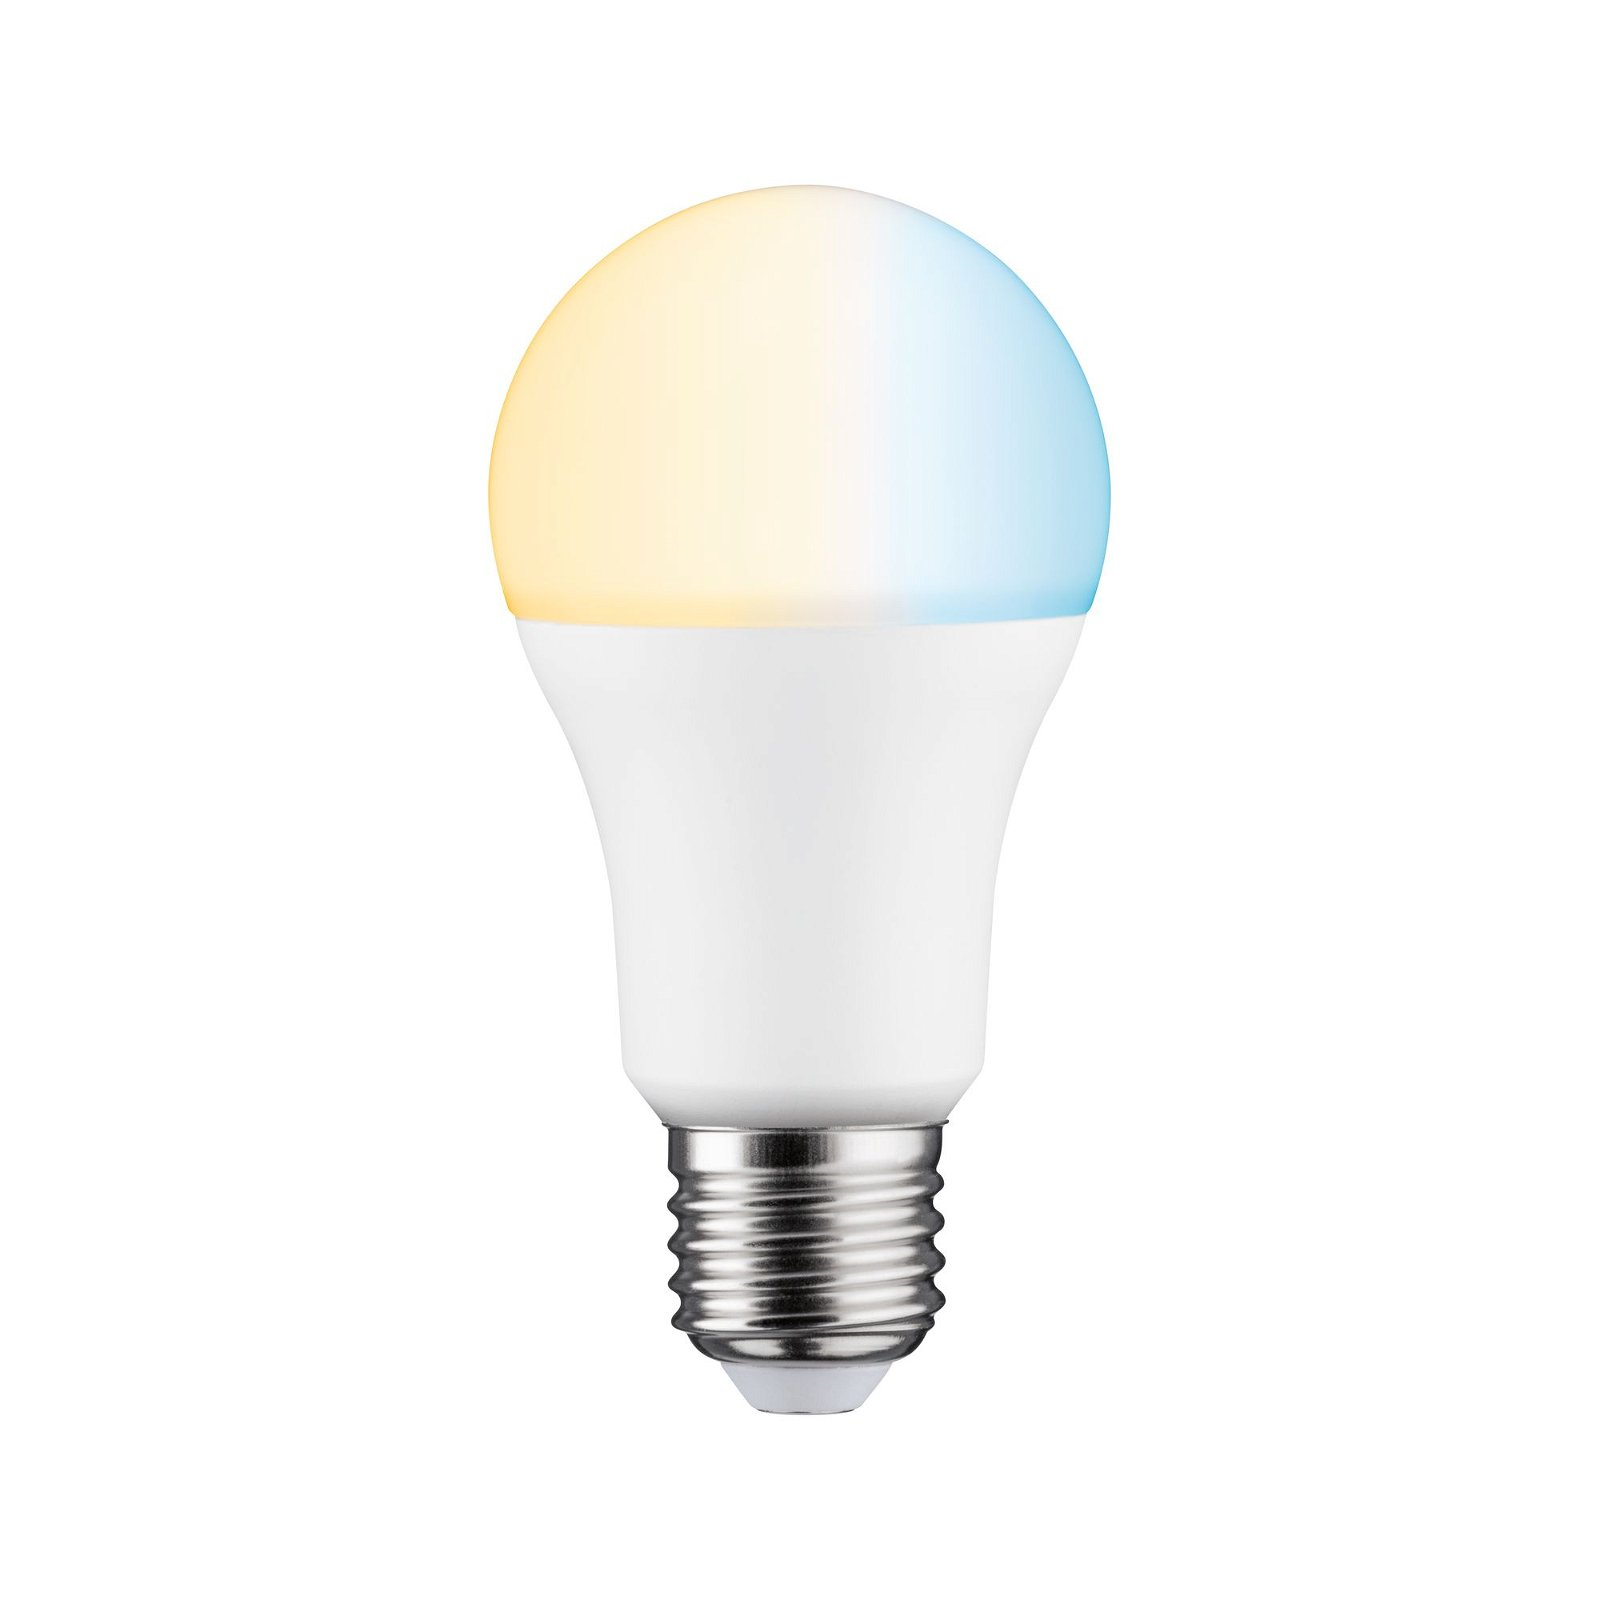 LED Birne Smart Home Zigbee E27 230V 820lm 9W 2700 - 6500K Matt